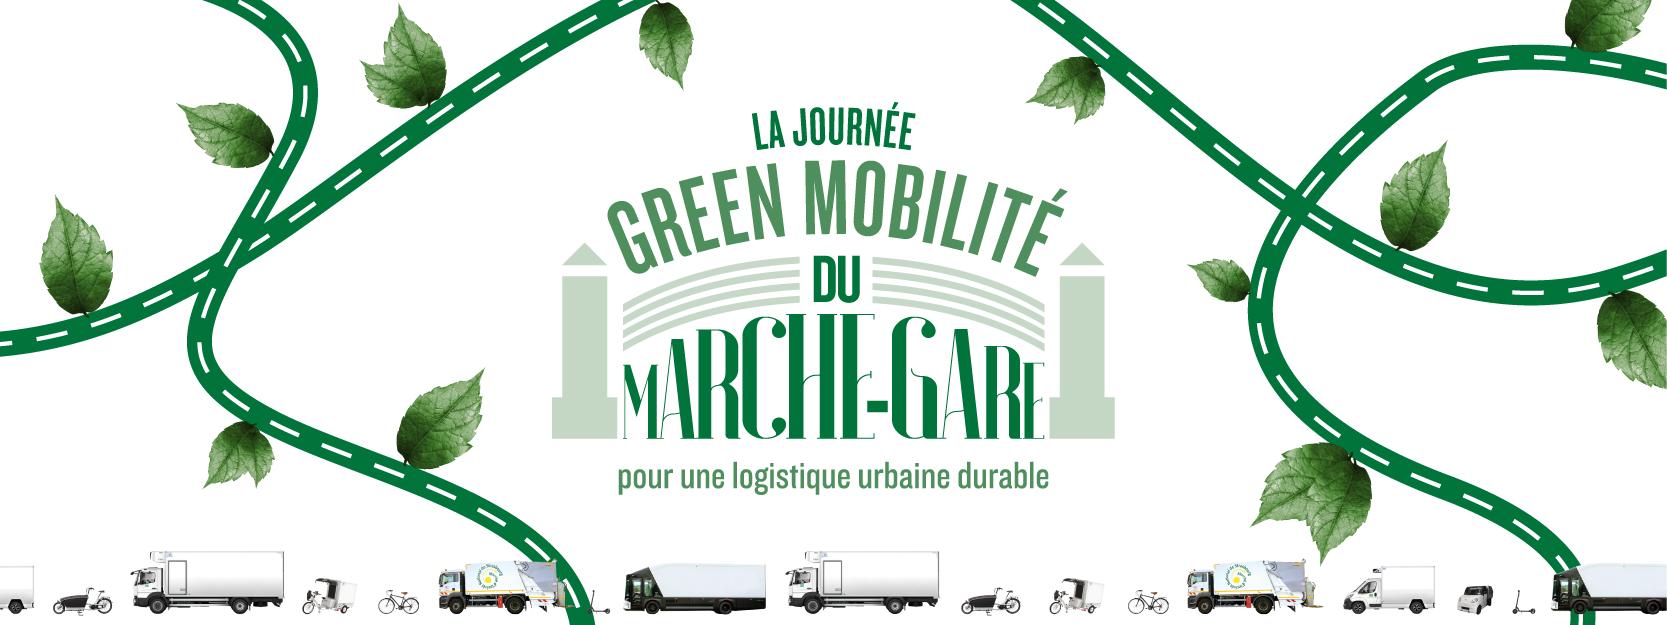 journee-green-mobilite